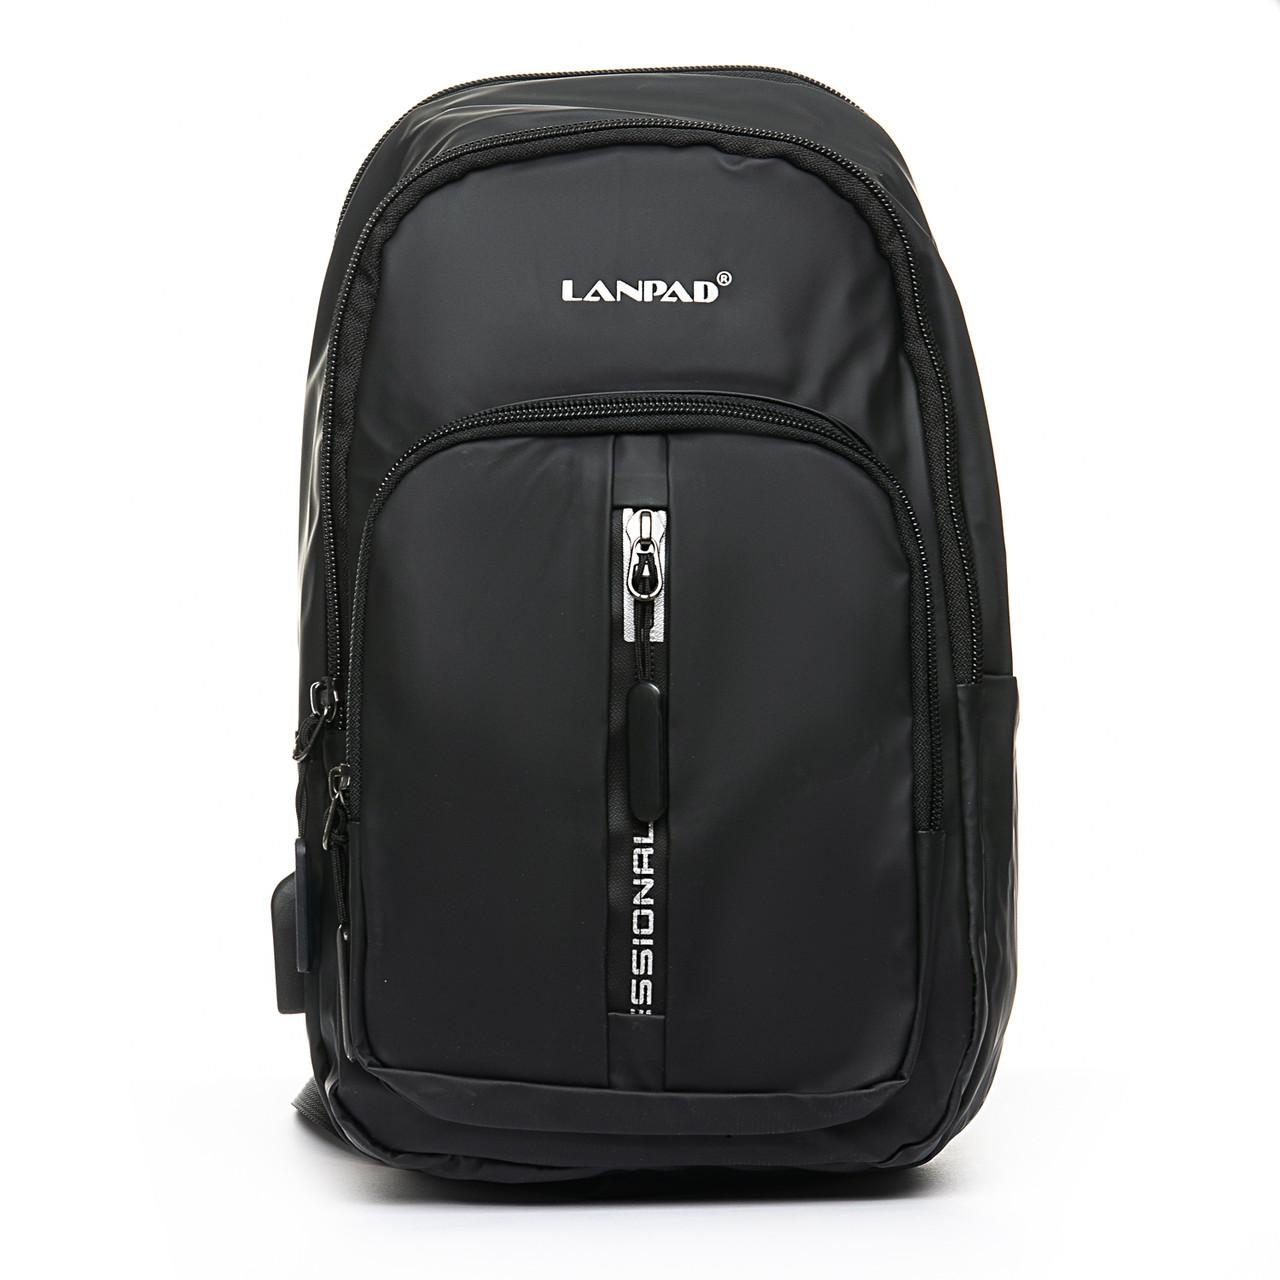 Мужская сумка через плече Lanpad 18 x 32 x 13 см Черный (4070/1)